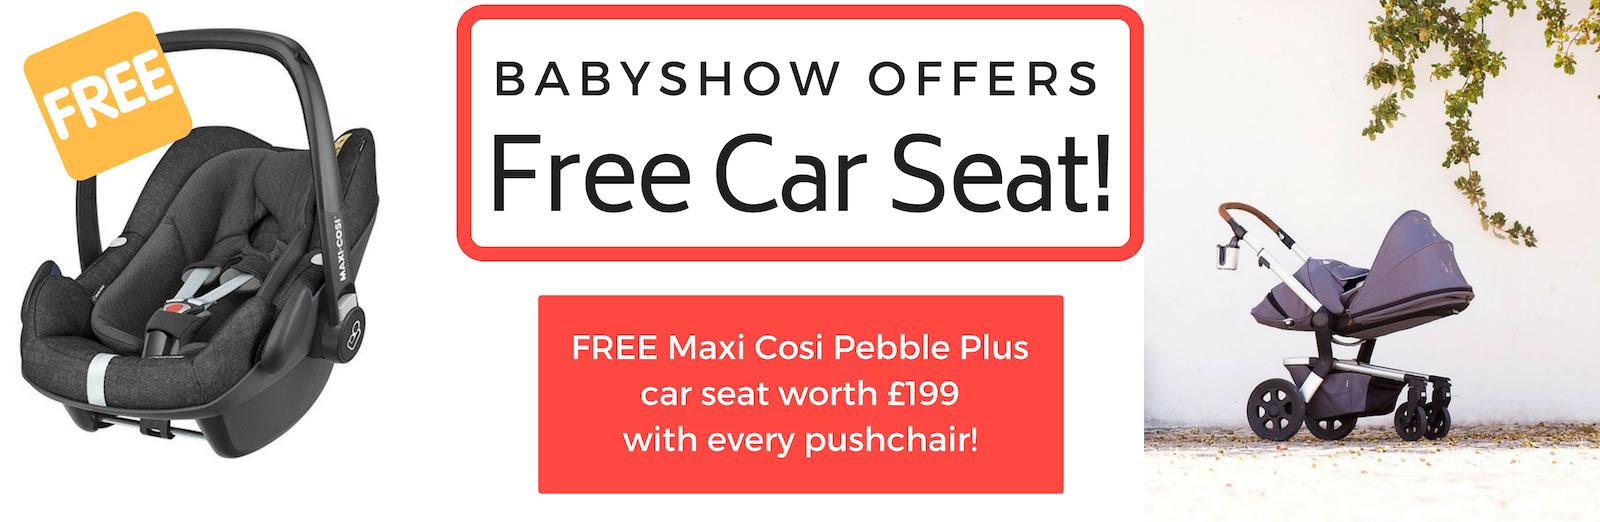 babyshow free pebble plus